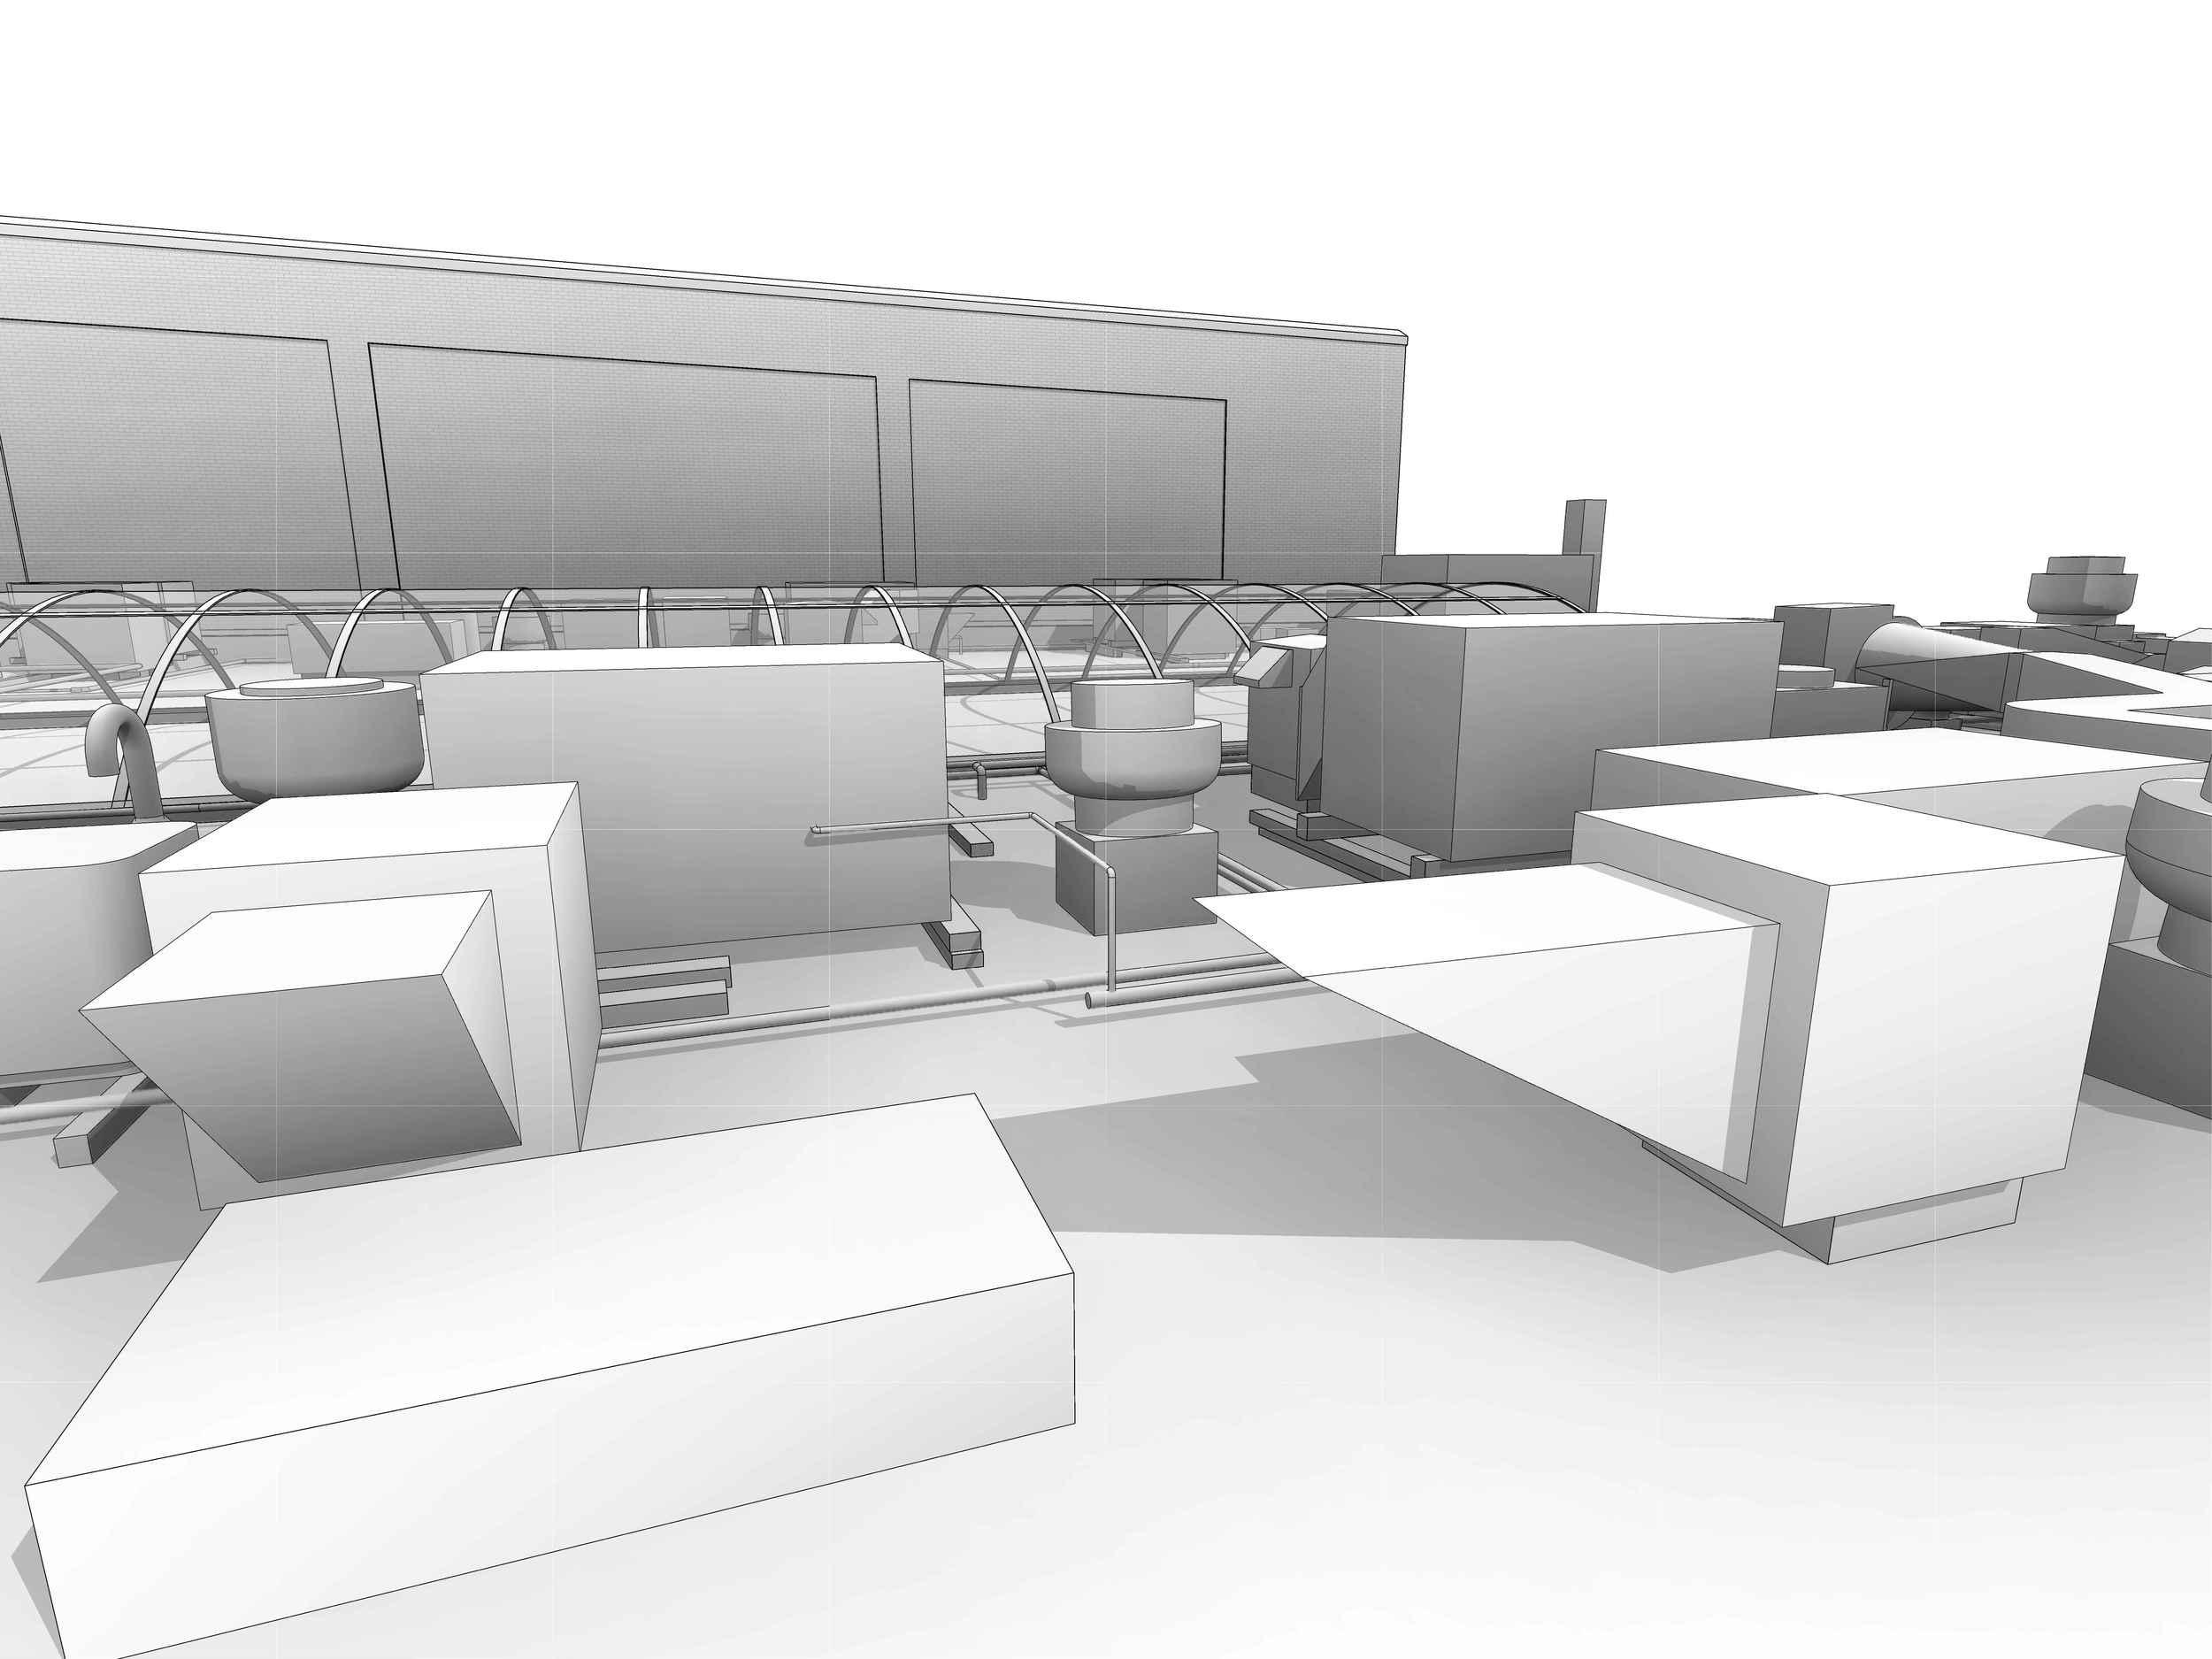 57 JFK Roof_ - 3D View - Copy (2) of 3D View 3.jpg